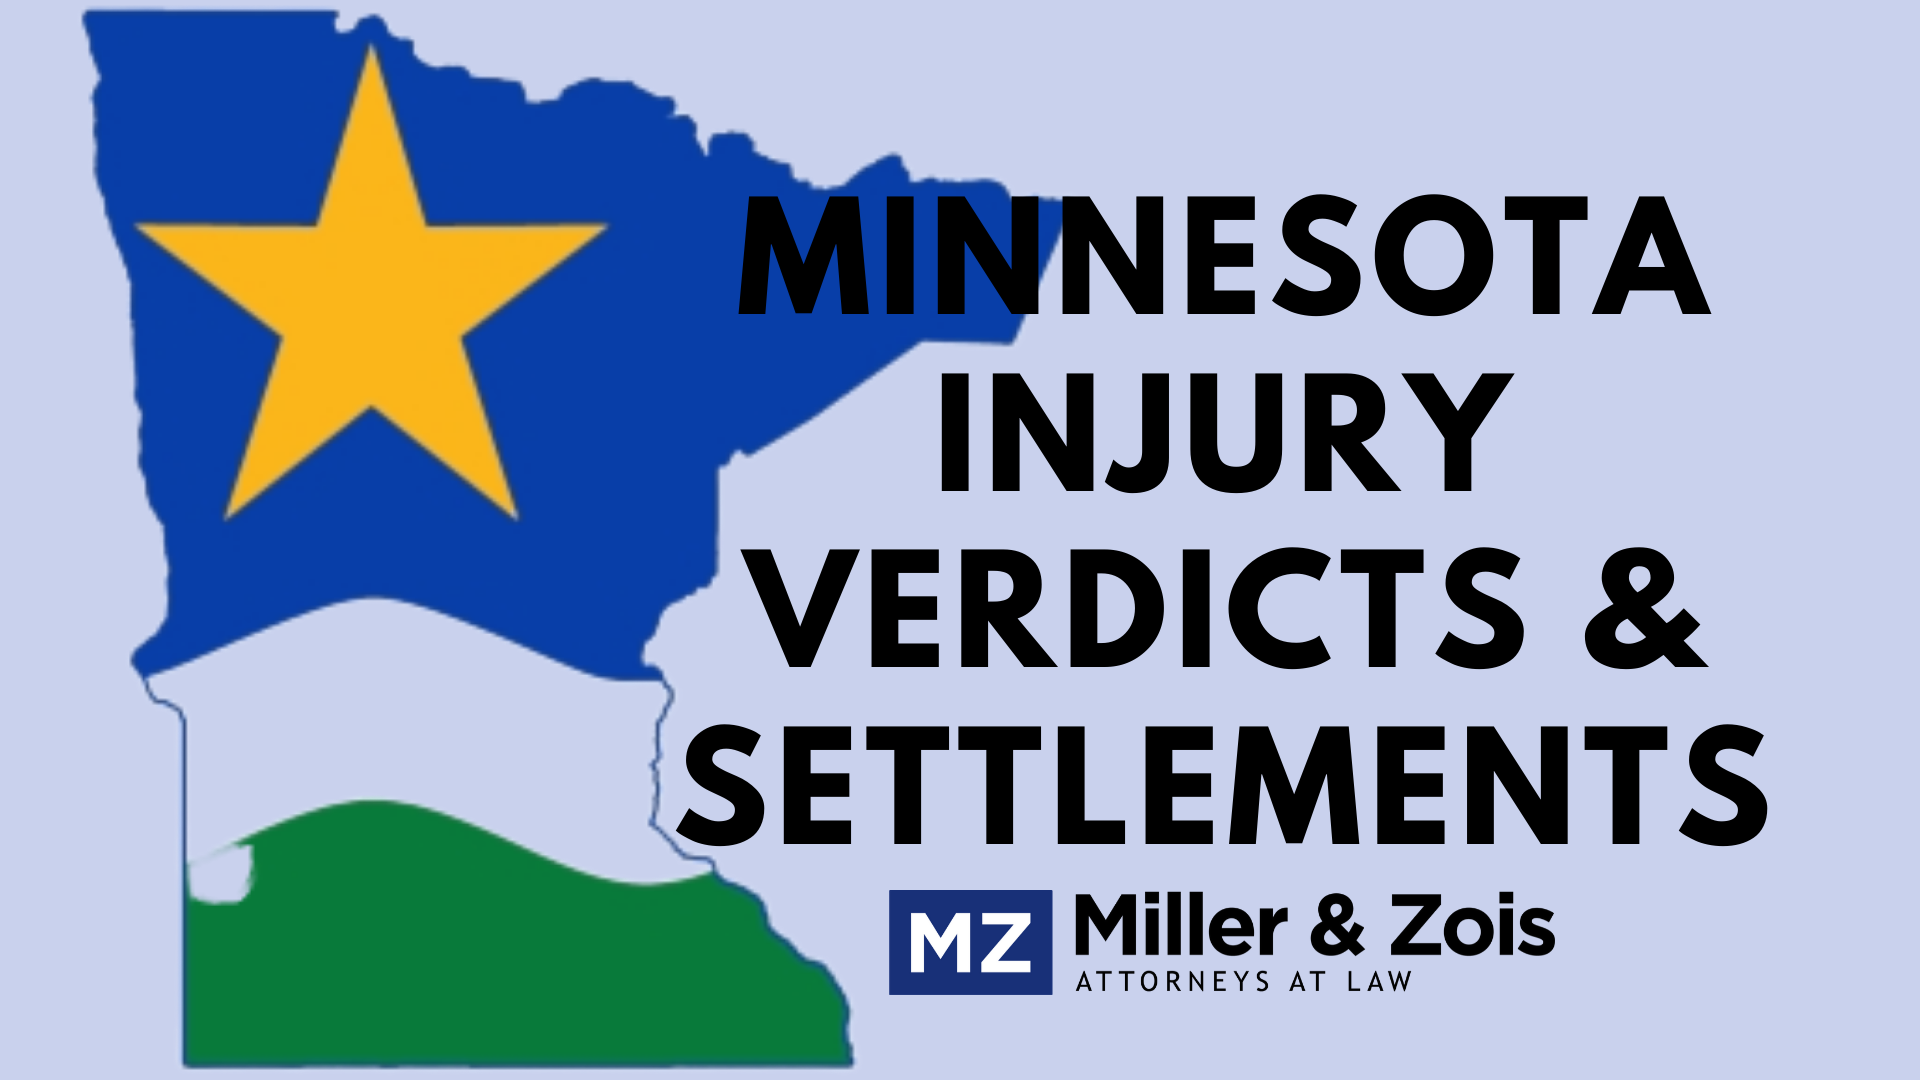 minnesota injury verdicts